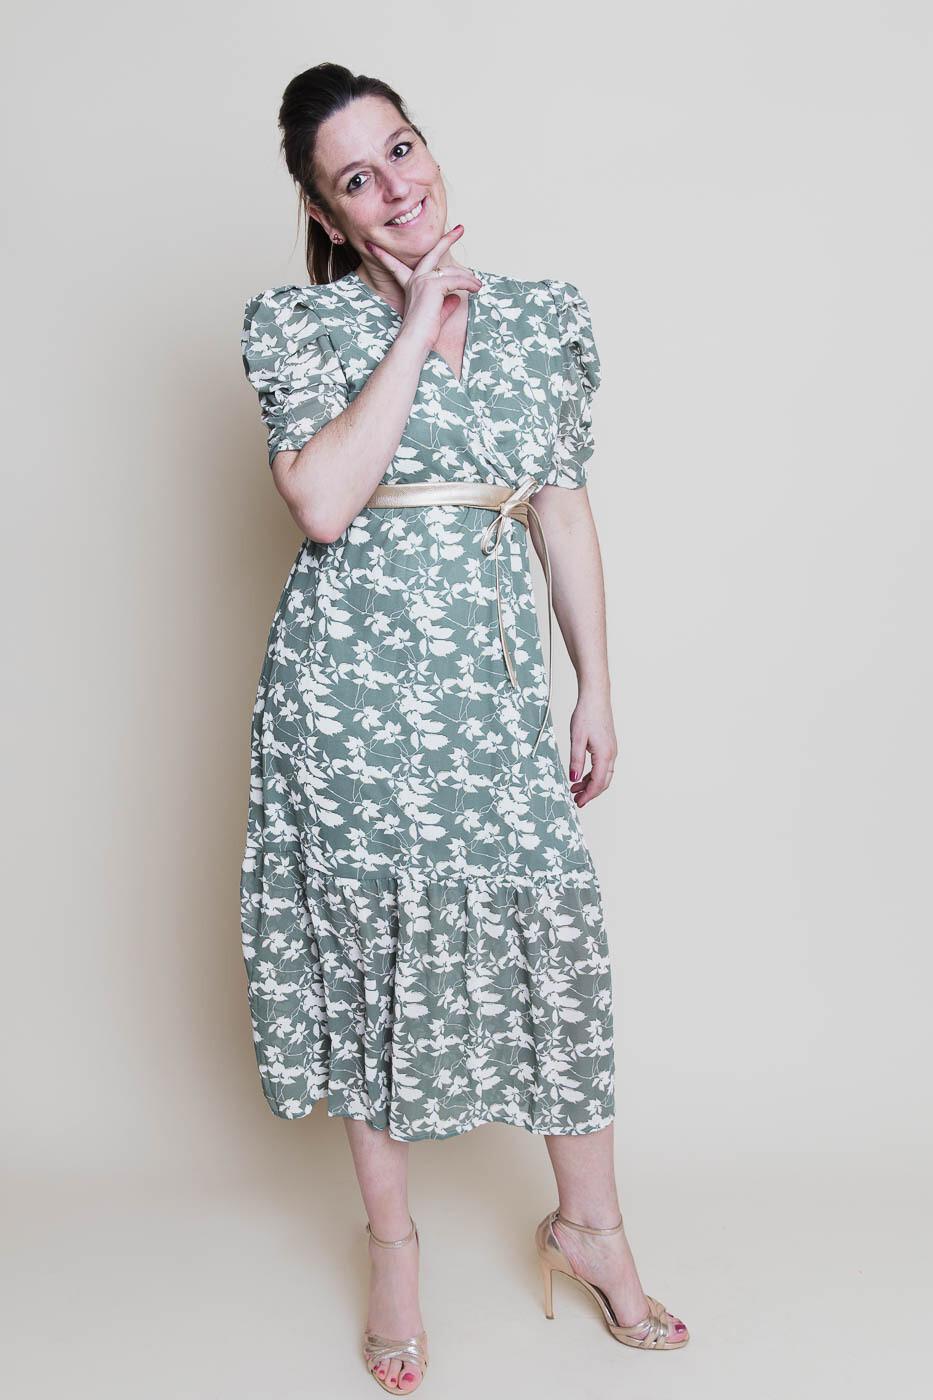 Midi jurk - FREDERIQUE - groen met witte blaadjes en goudrandje